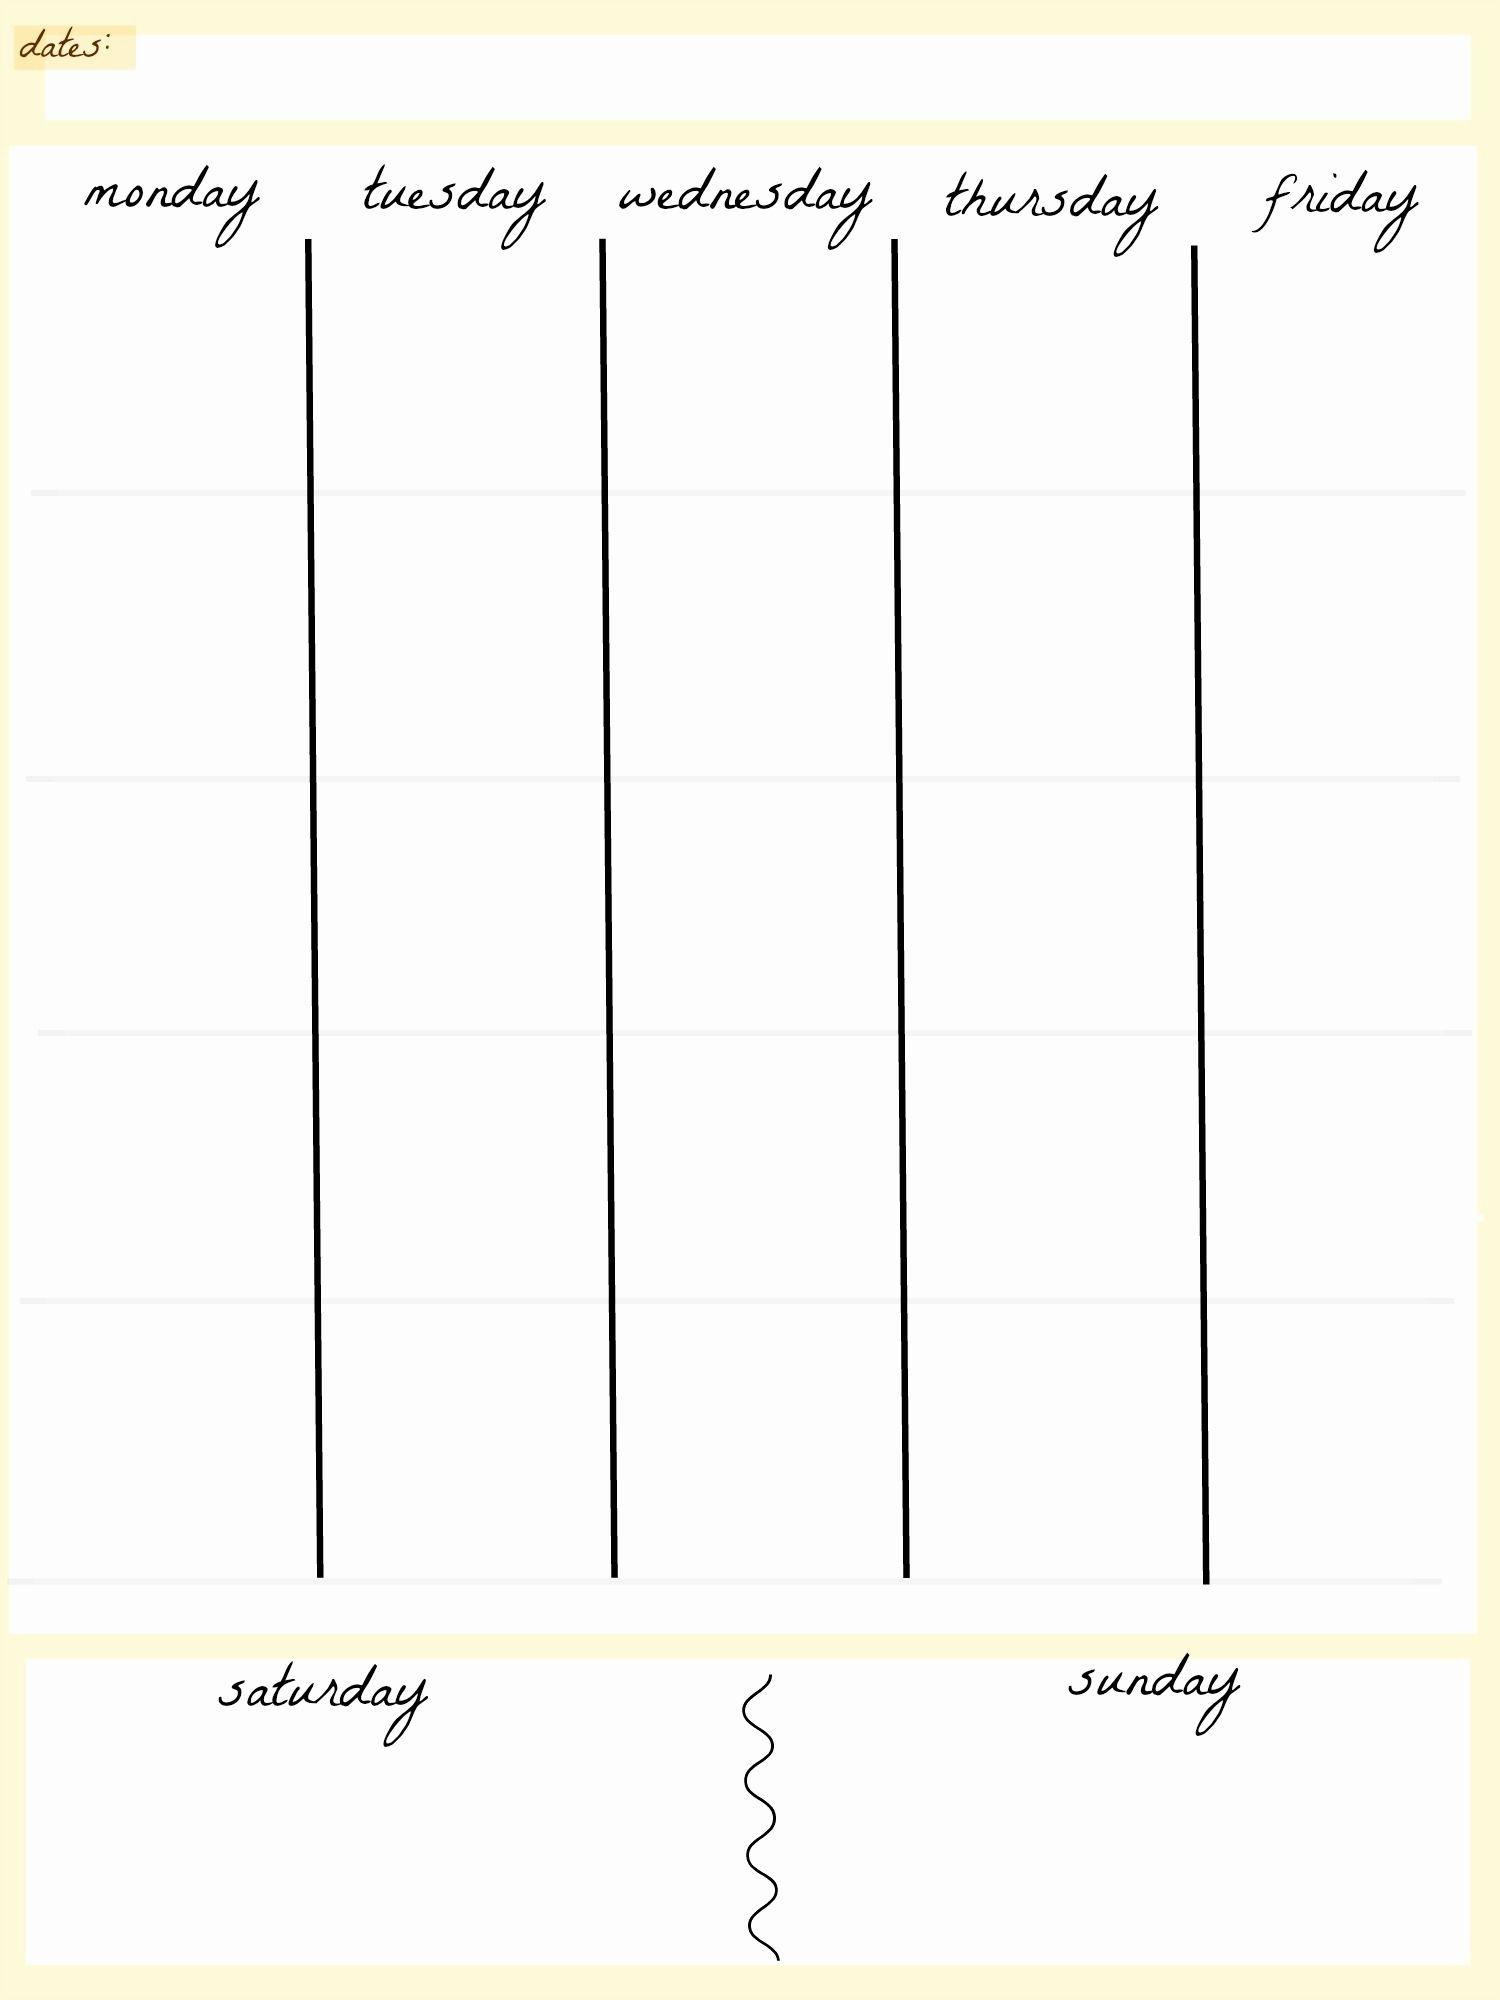 Blank Calendar 5 Day Week | Blank Calendar Template Dowload pertaining to Printable Blank Weekly Calendar